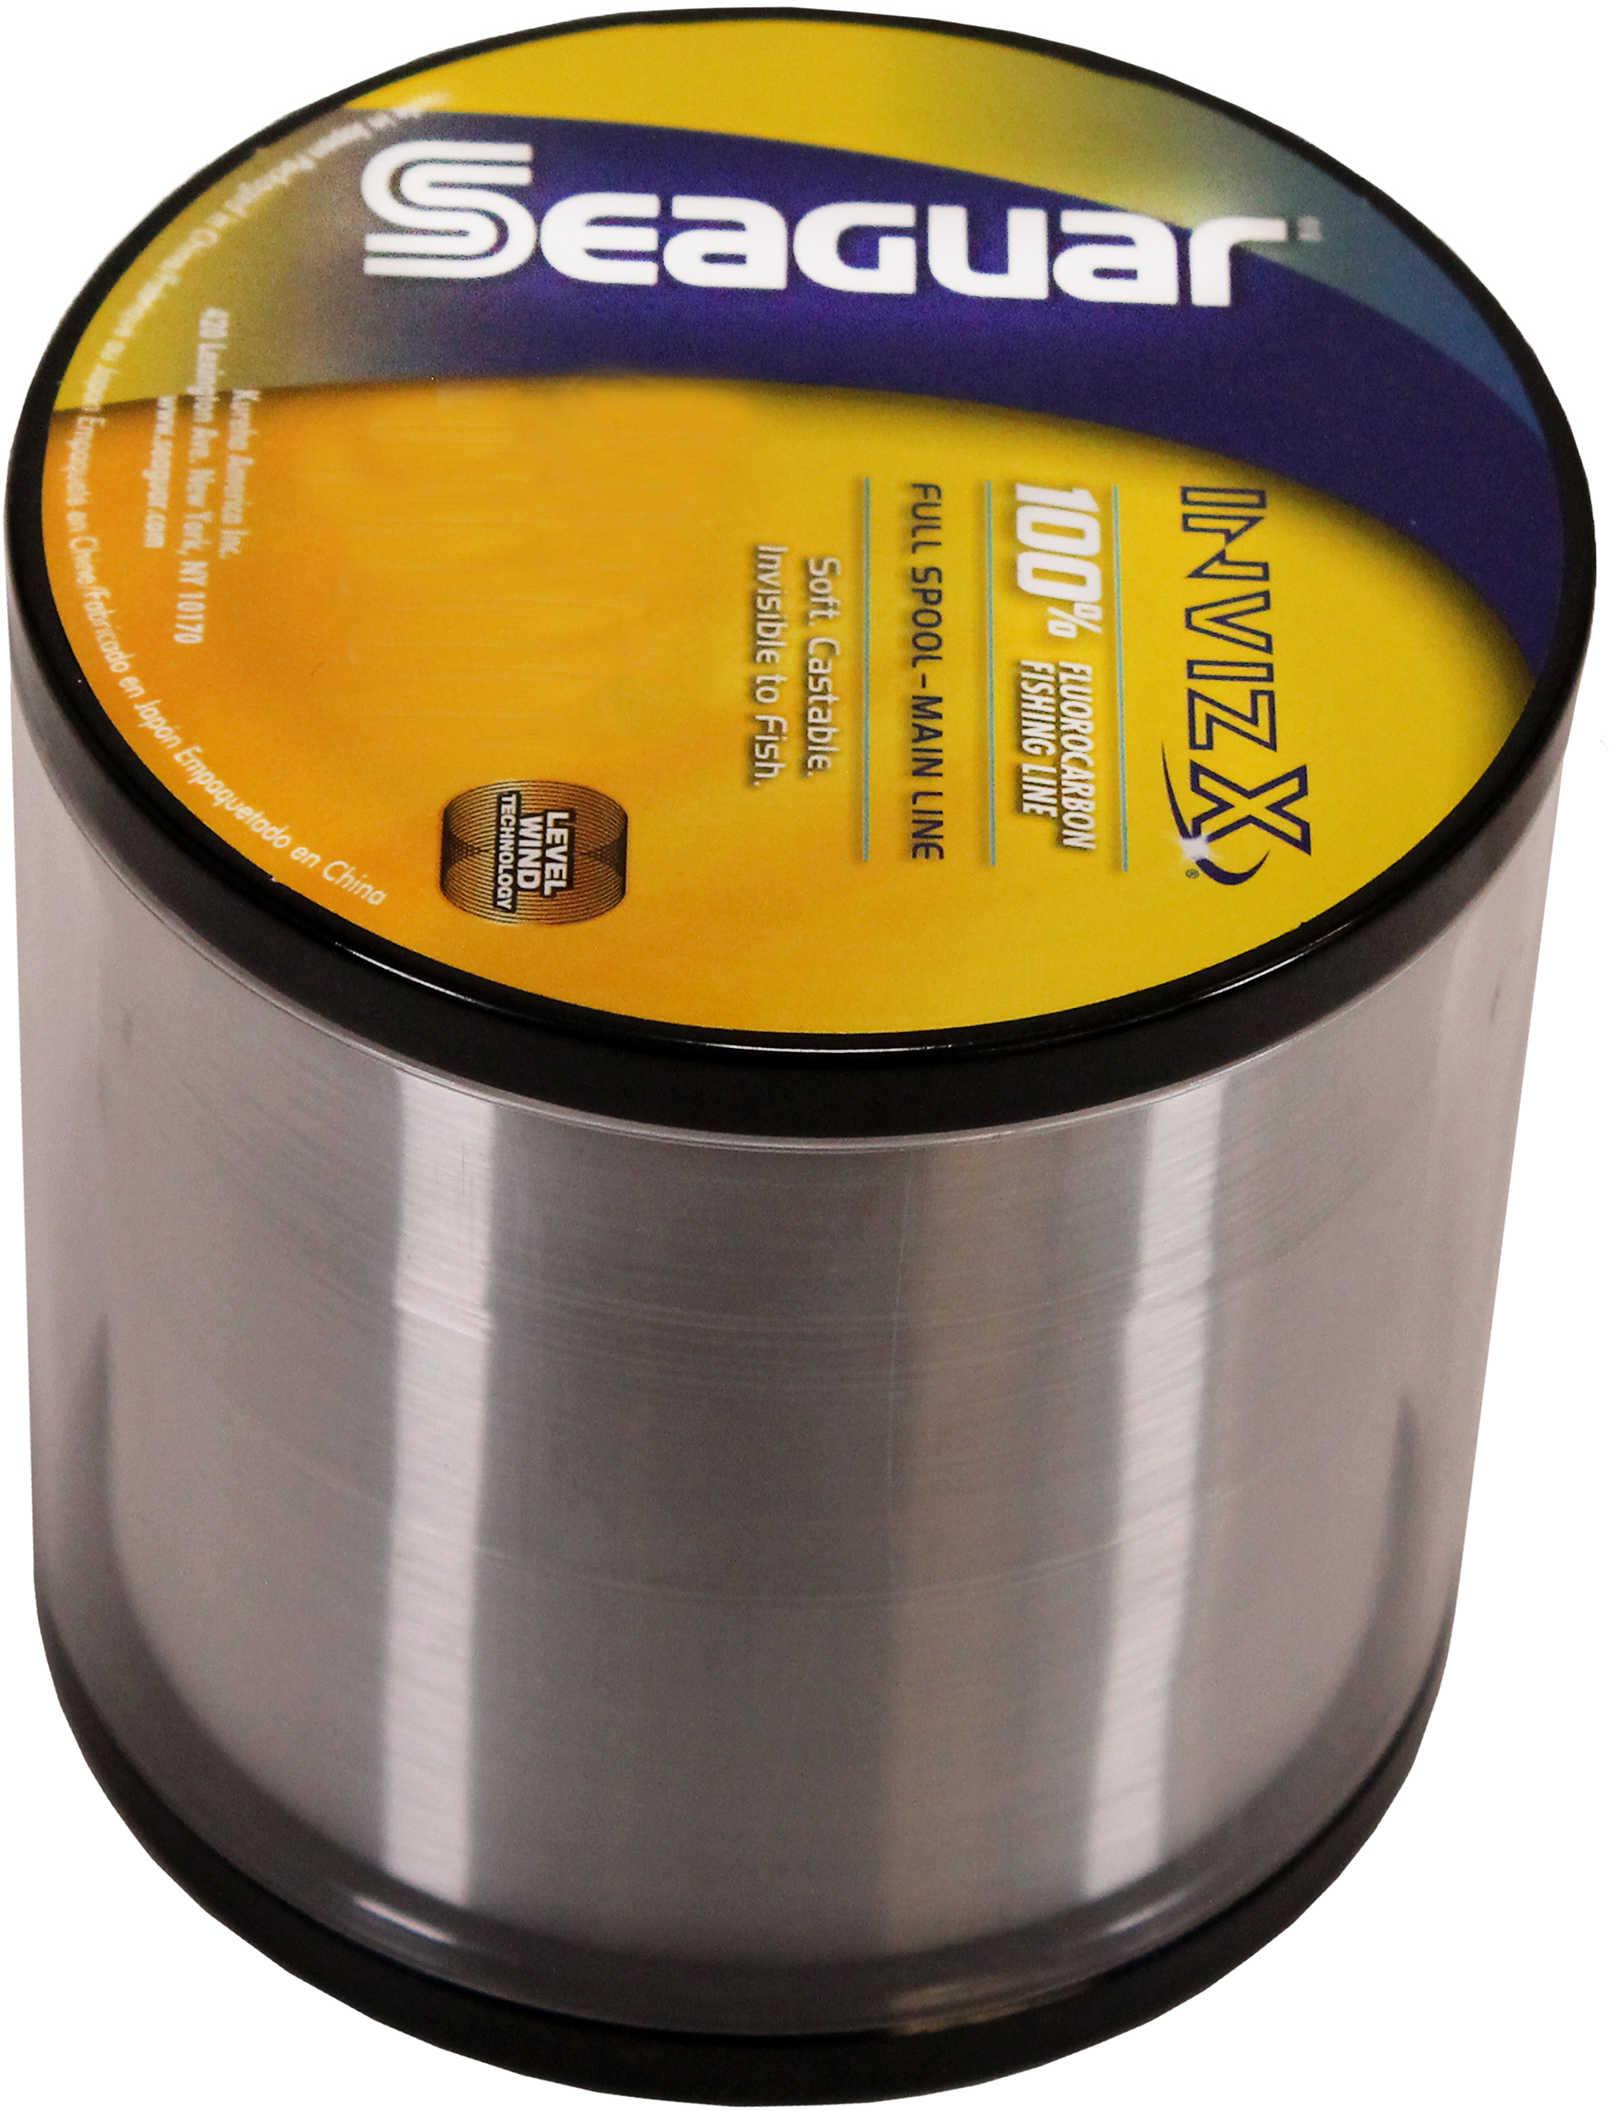 Seaguar / Kureha America Seaguar Inviz X Fluorcarbon Clear 1000yds 15lb Md#: 15VZ-1000